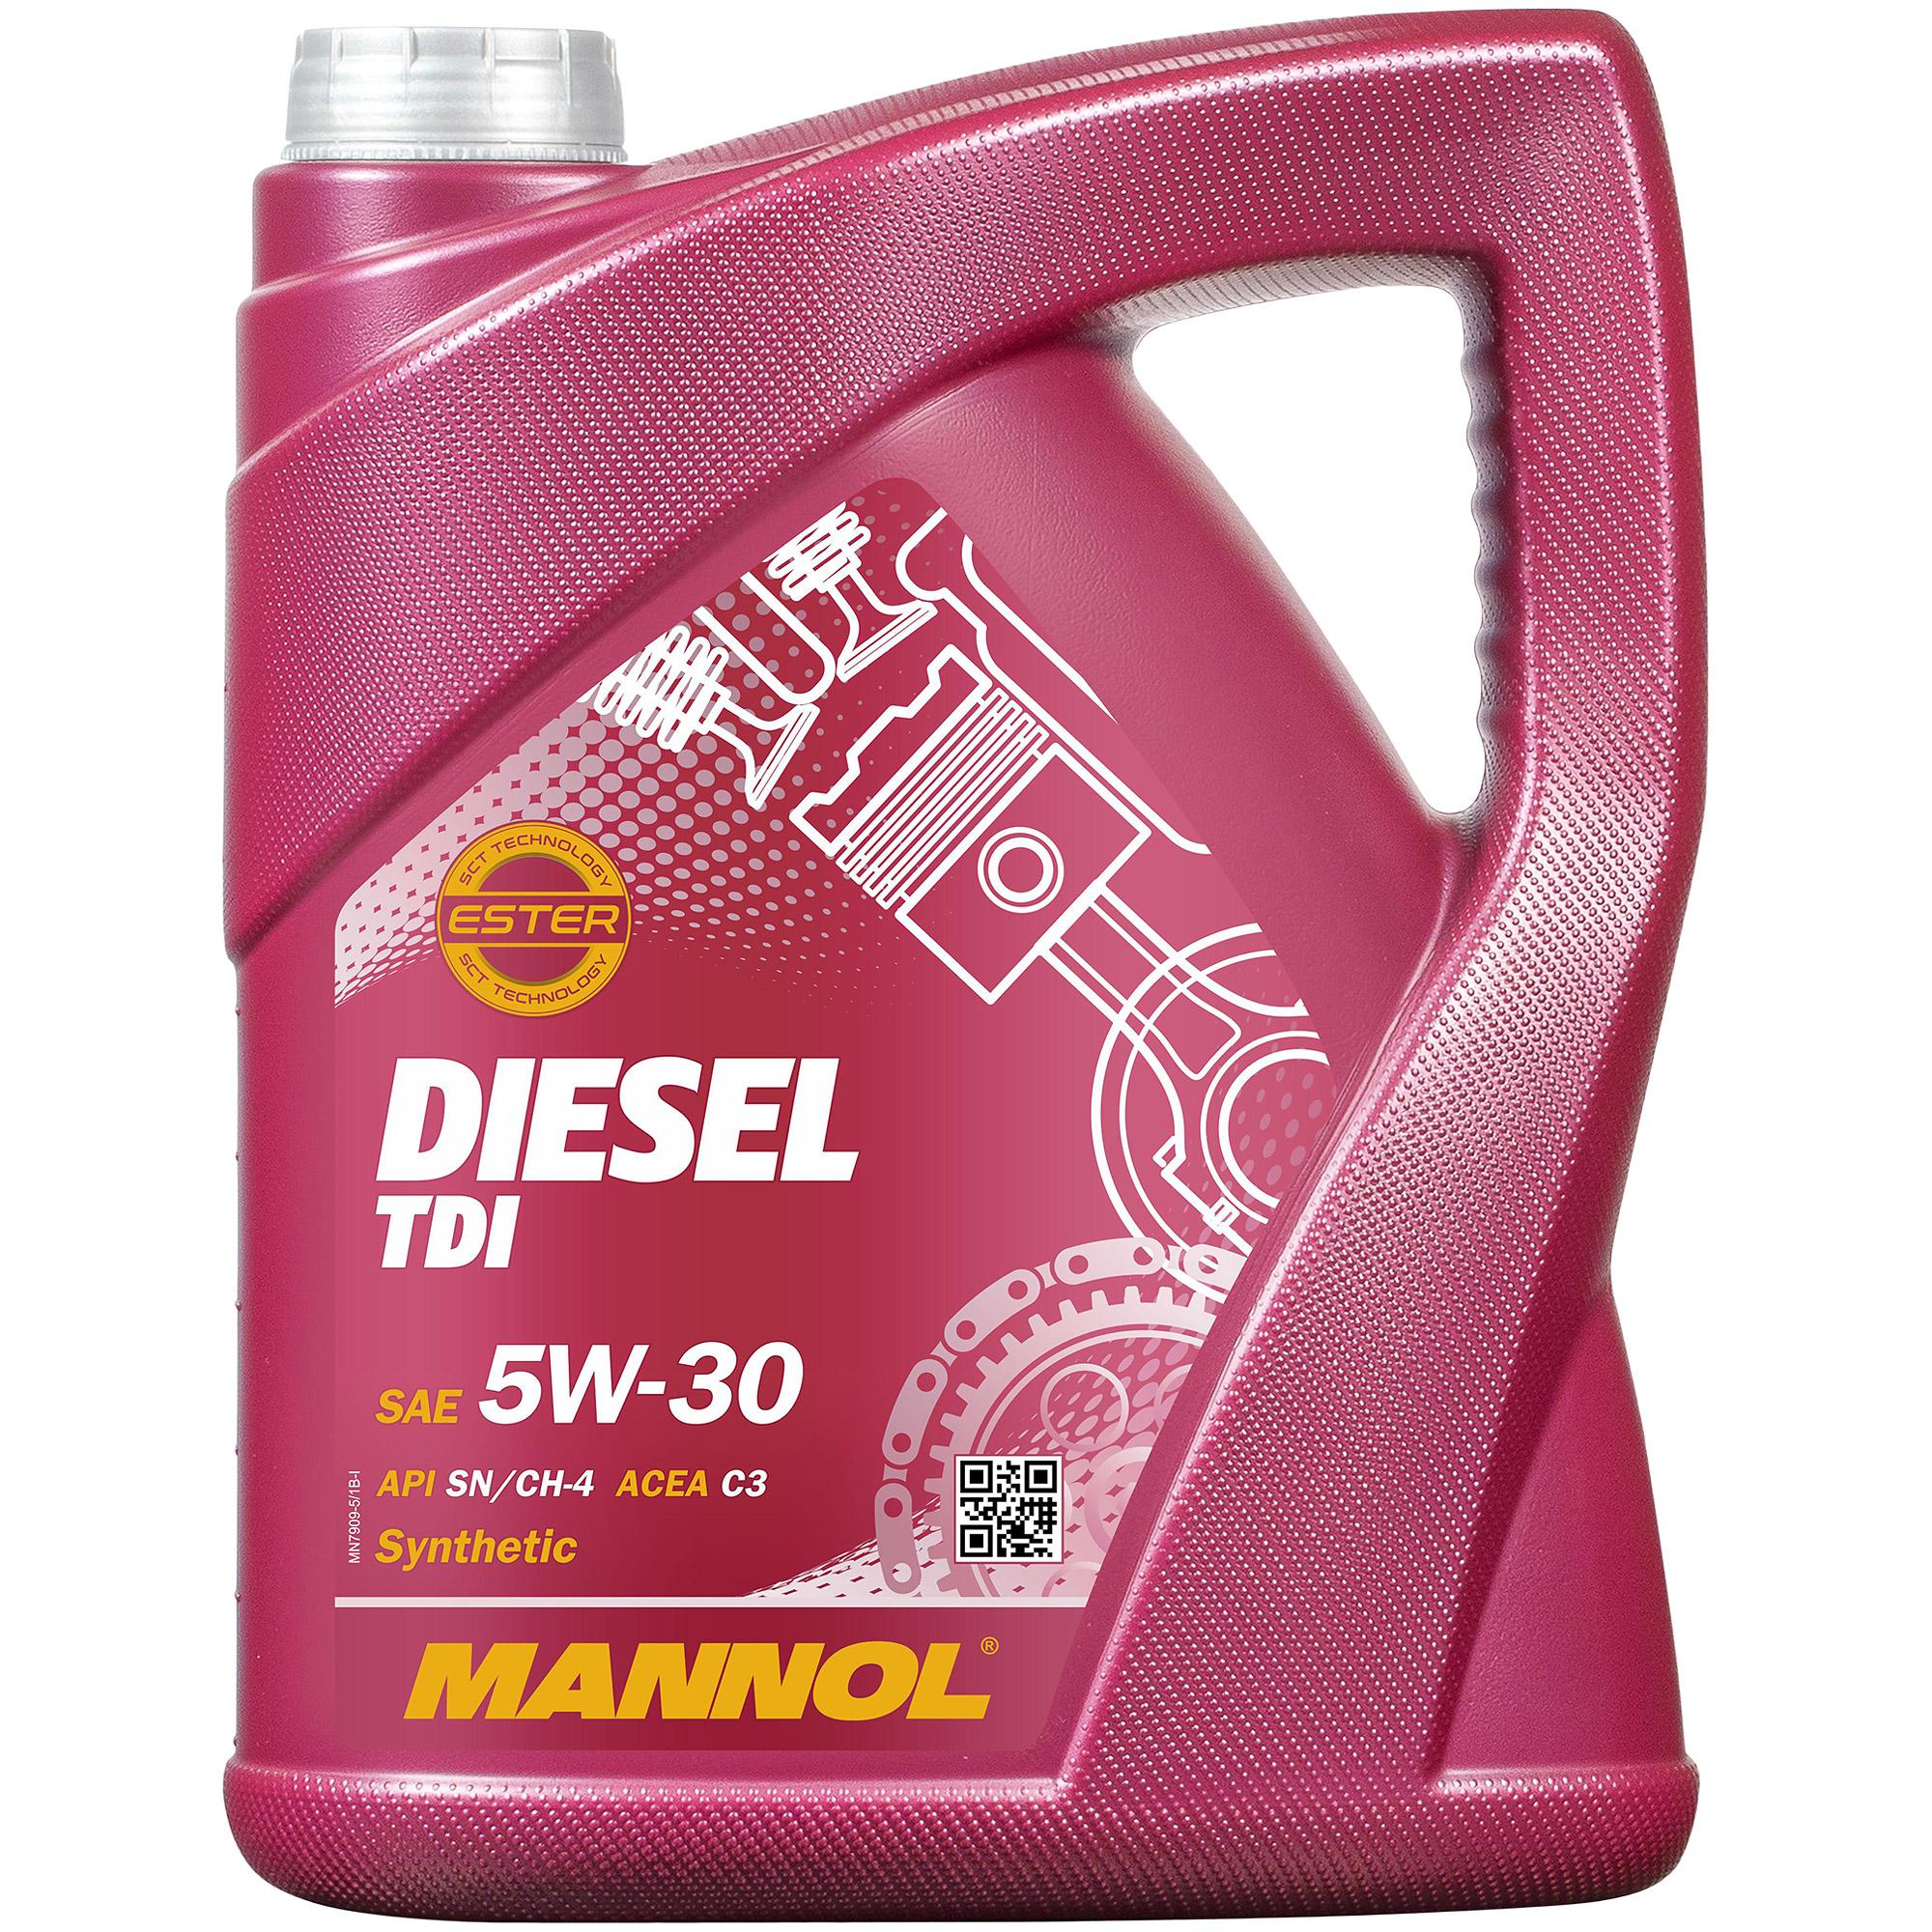 5l-aceite-del-motor-MANNOL-5w-40-10w-40-15w-40-5w-30-motorspulung-motor-flush-limpiador miniatura 16